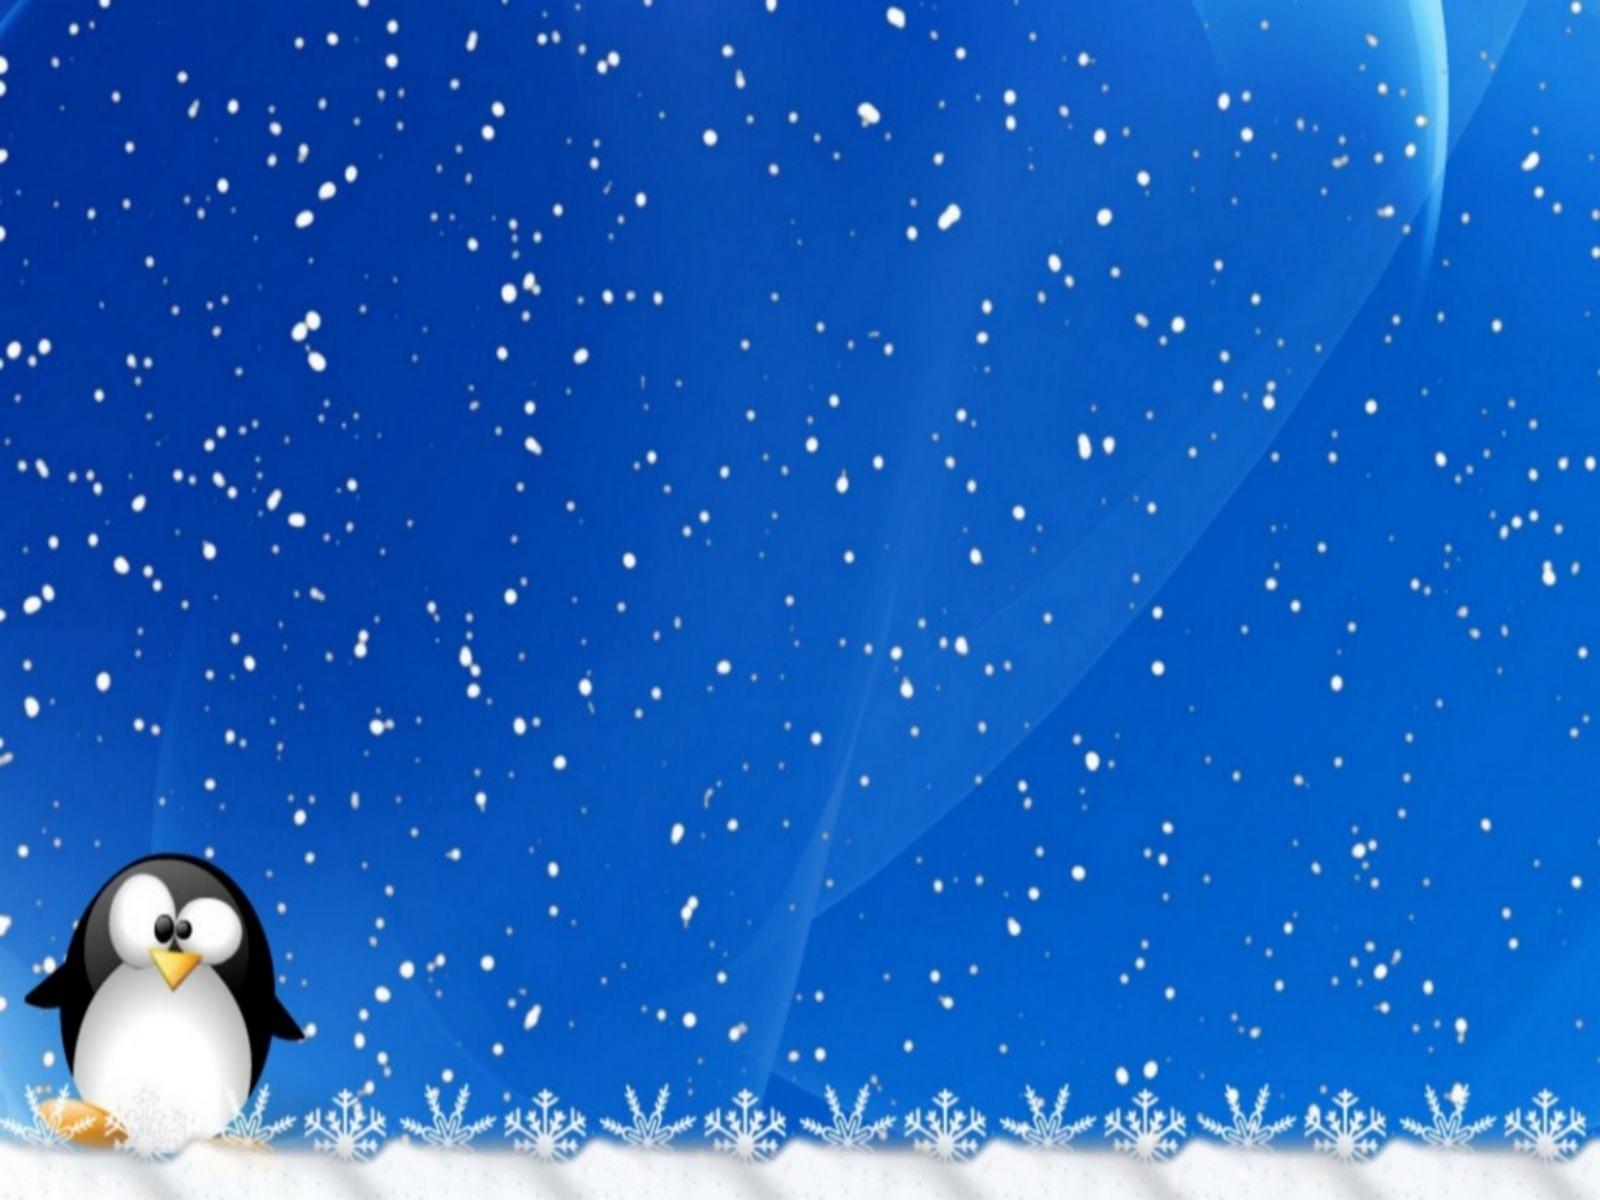 Winter desktop clipart.